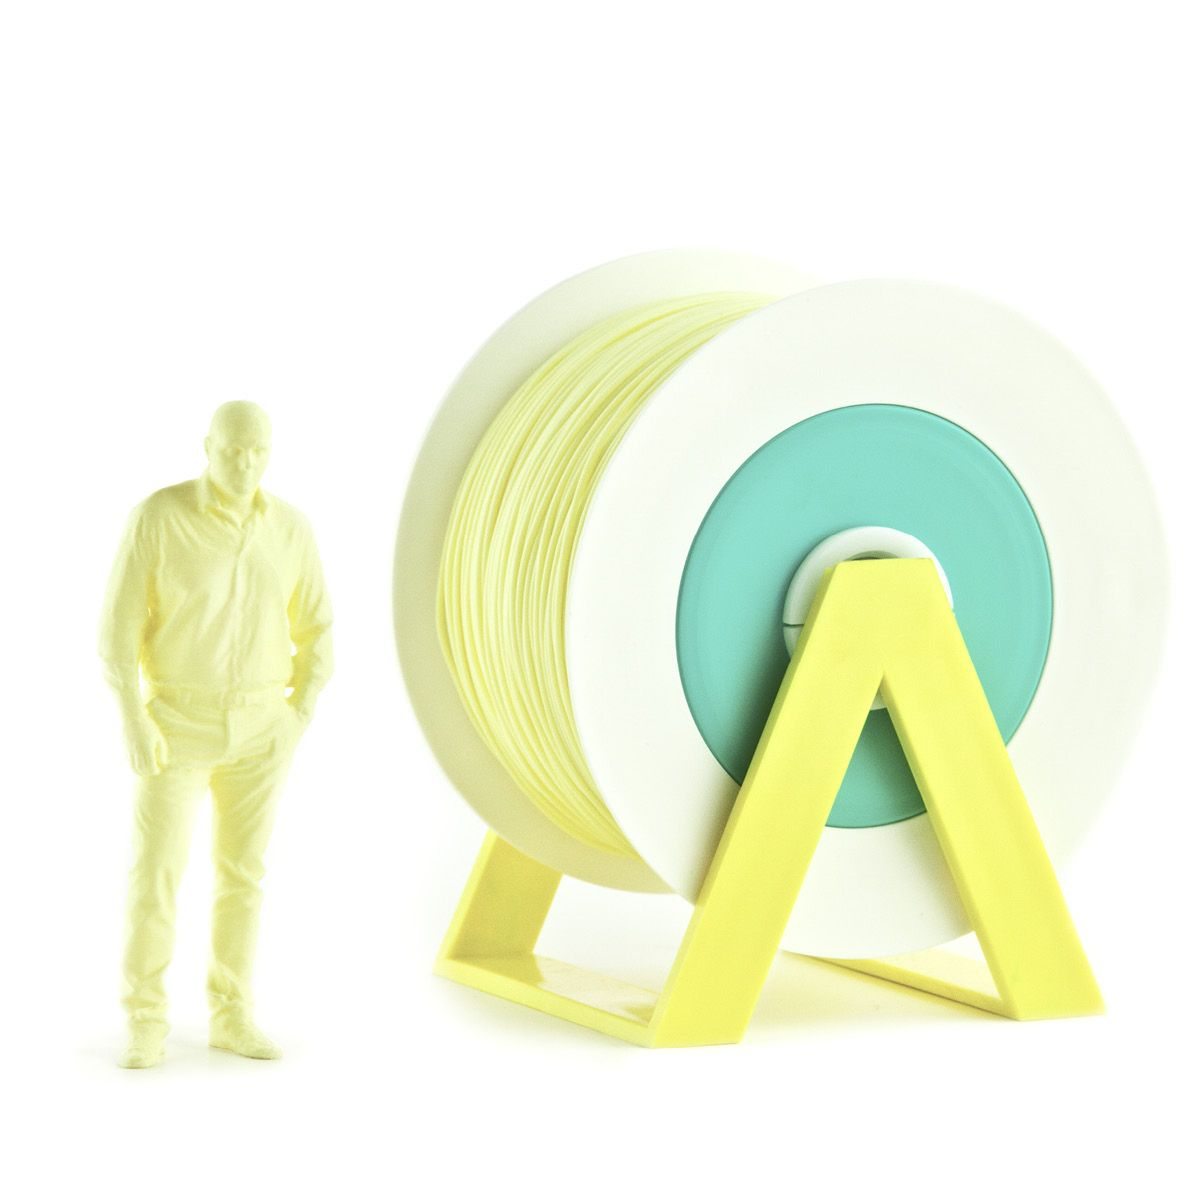 PLA Filament | Color: Straw Yellow